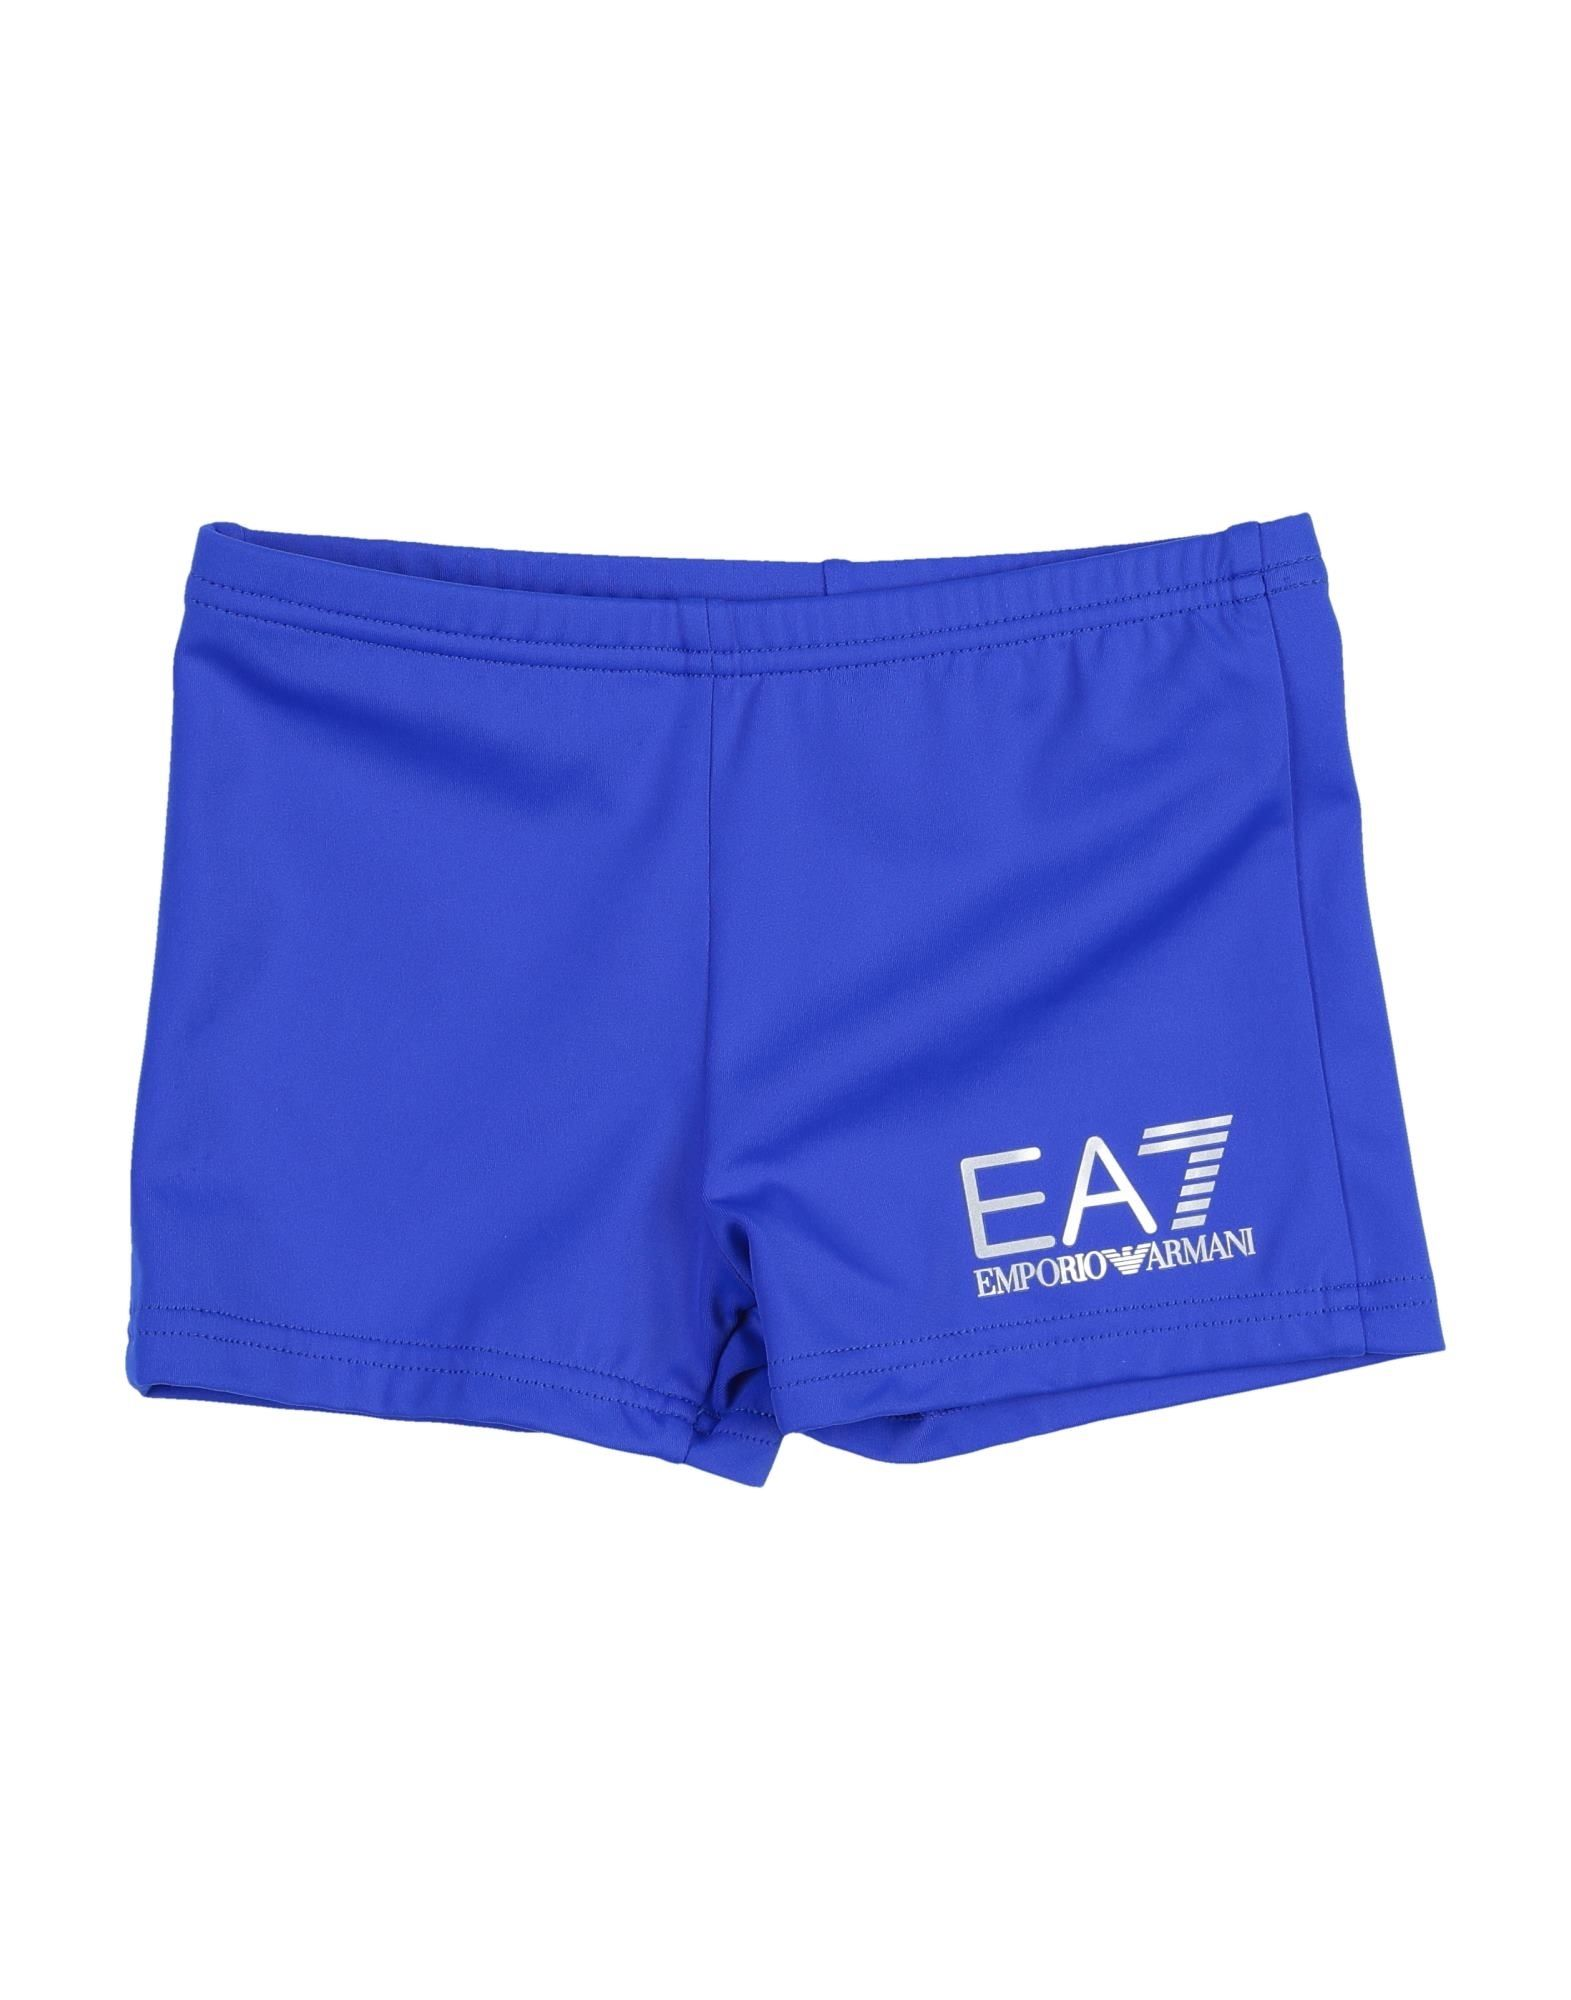 EA7 Swim trunks - Item 47222174